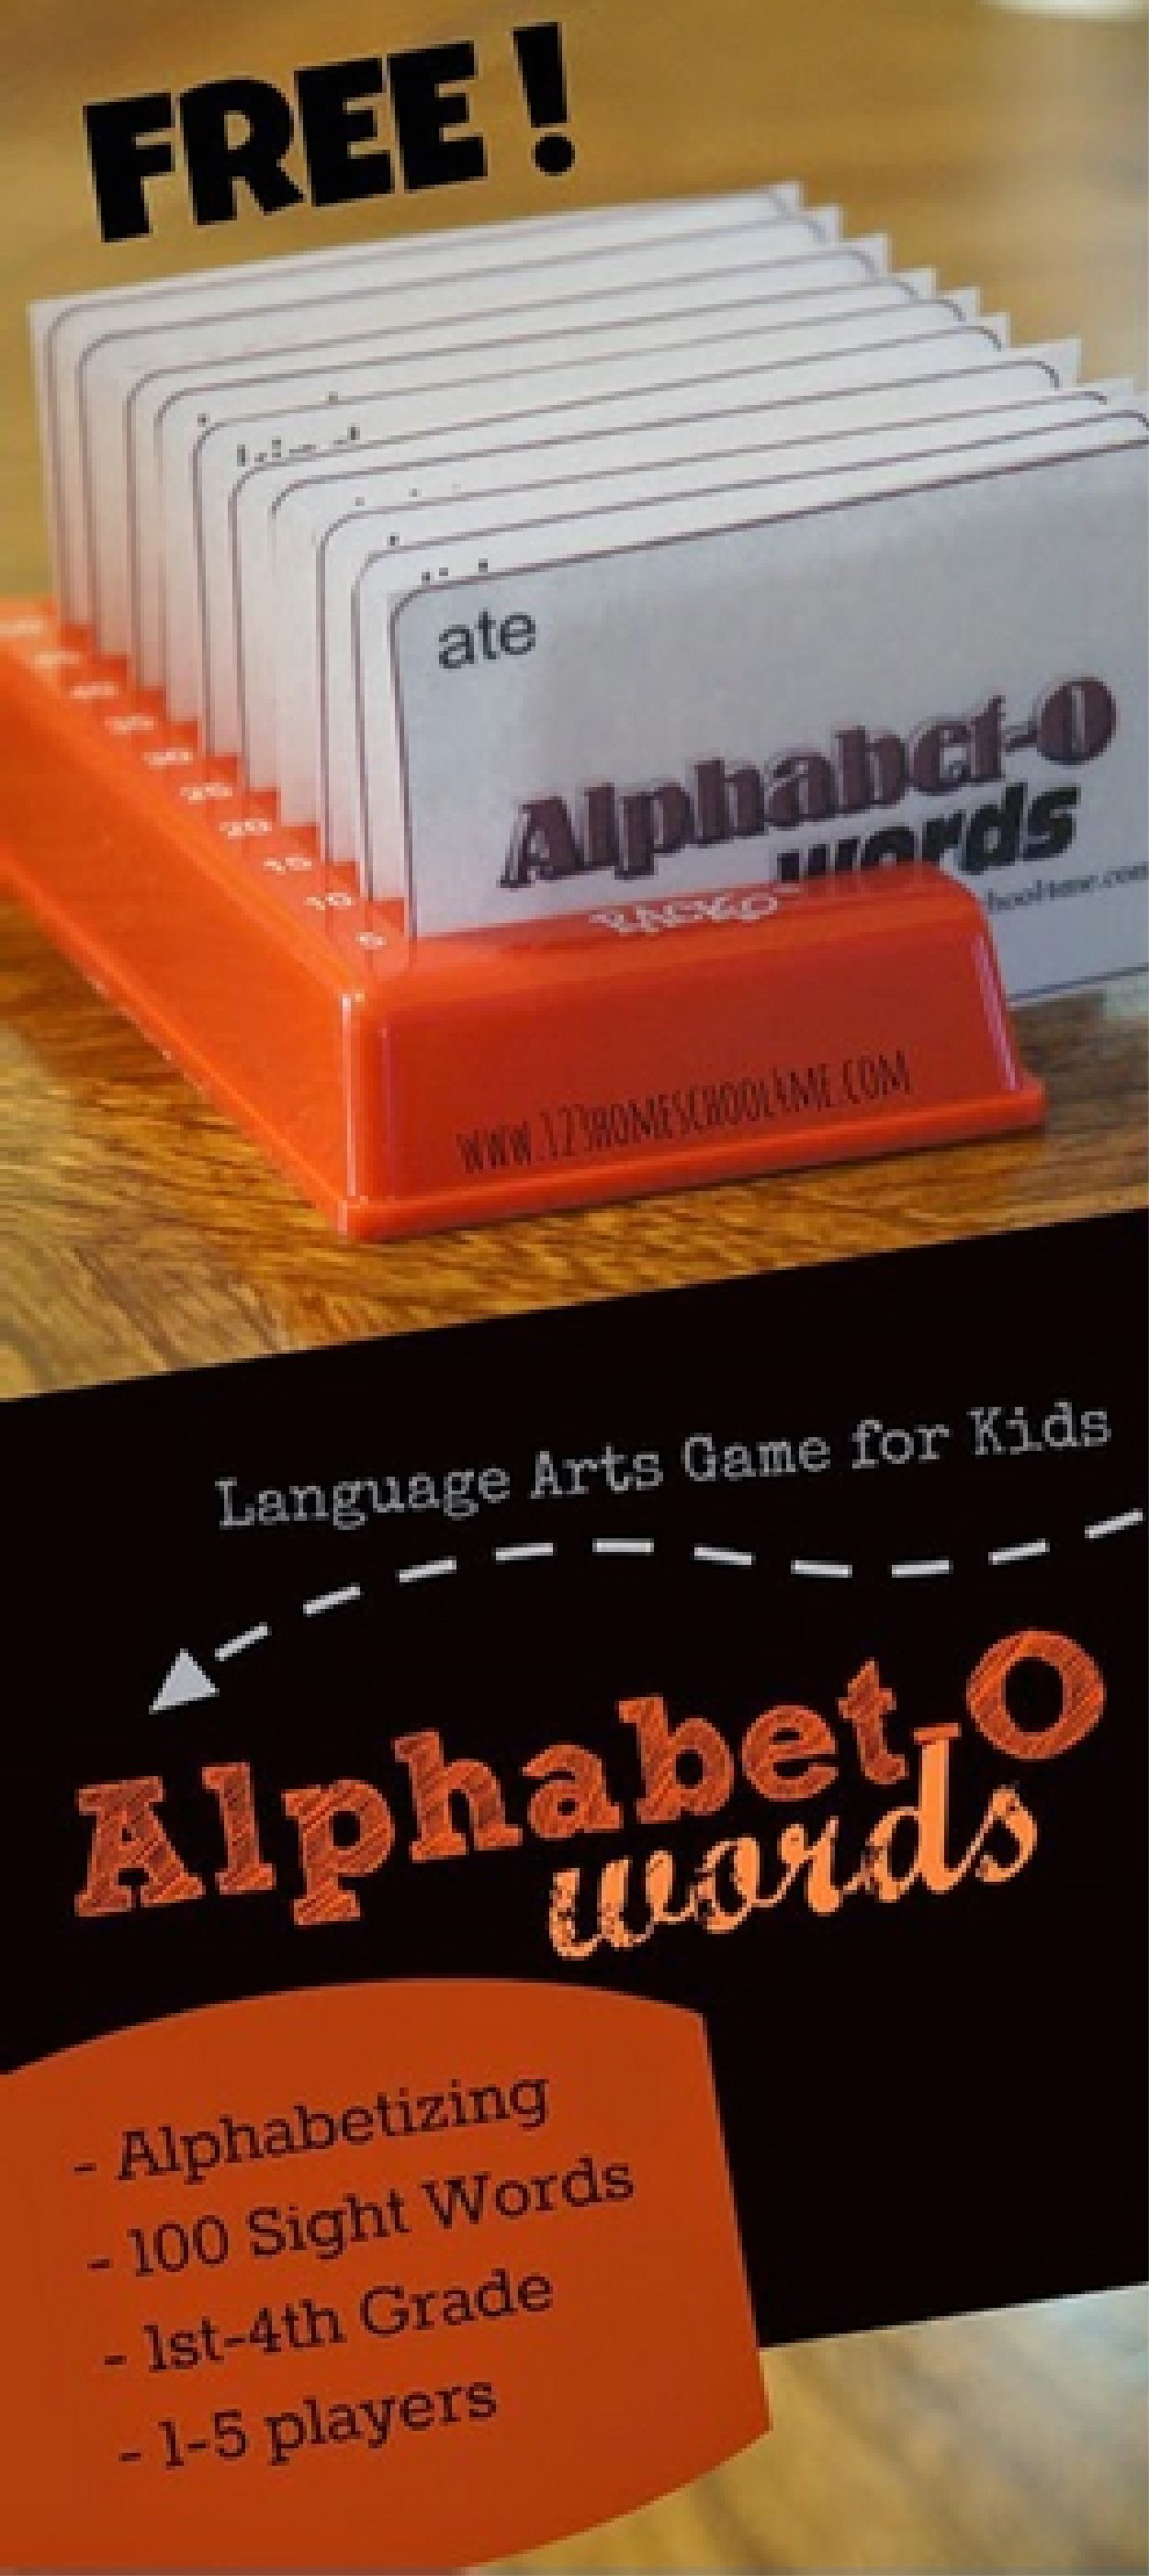 AlphabetO Words Alphabetizing Game Sight words